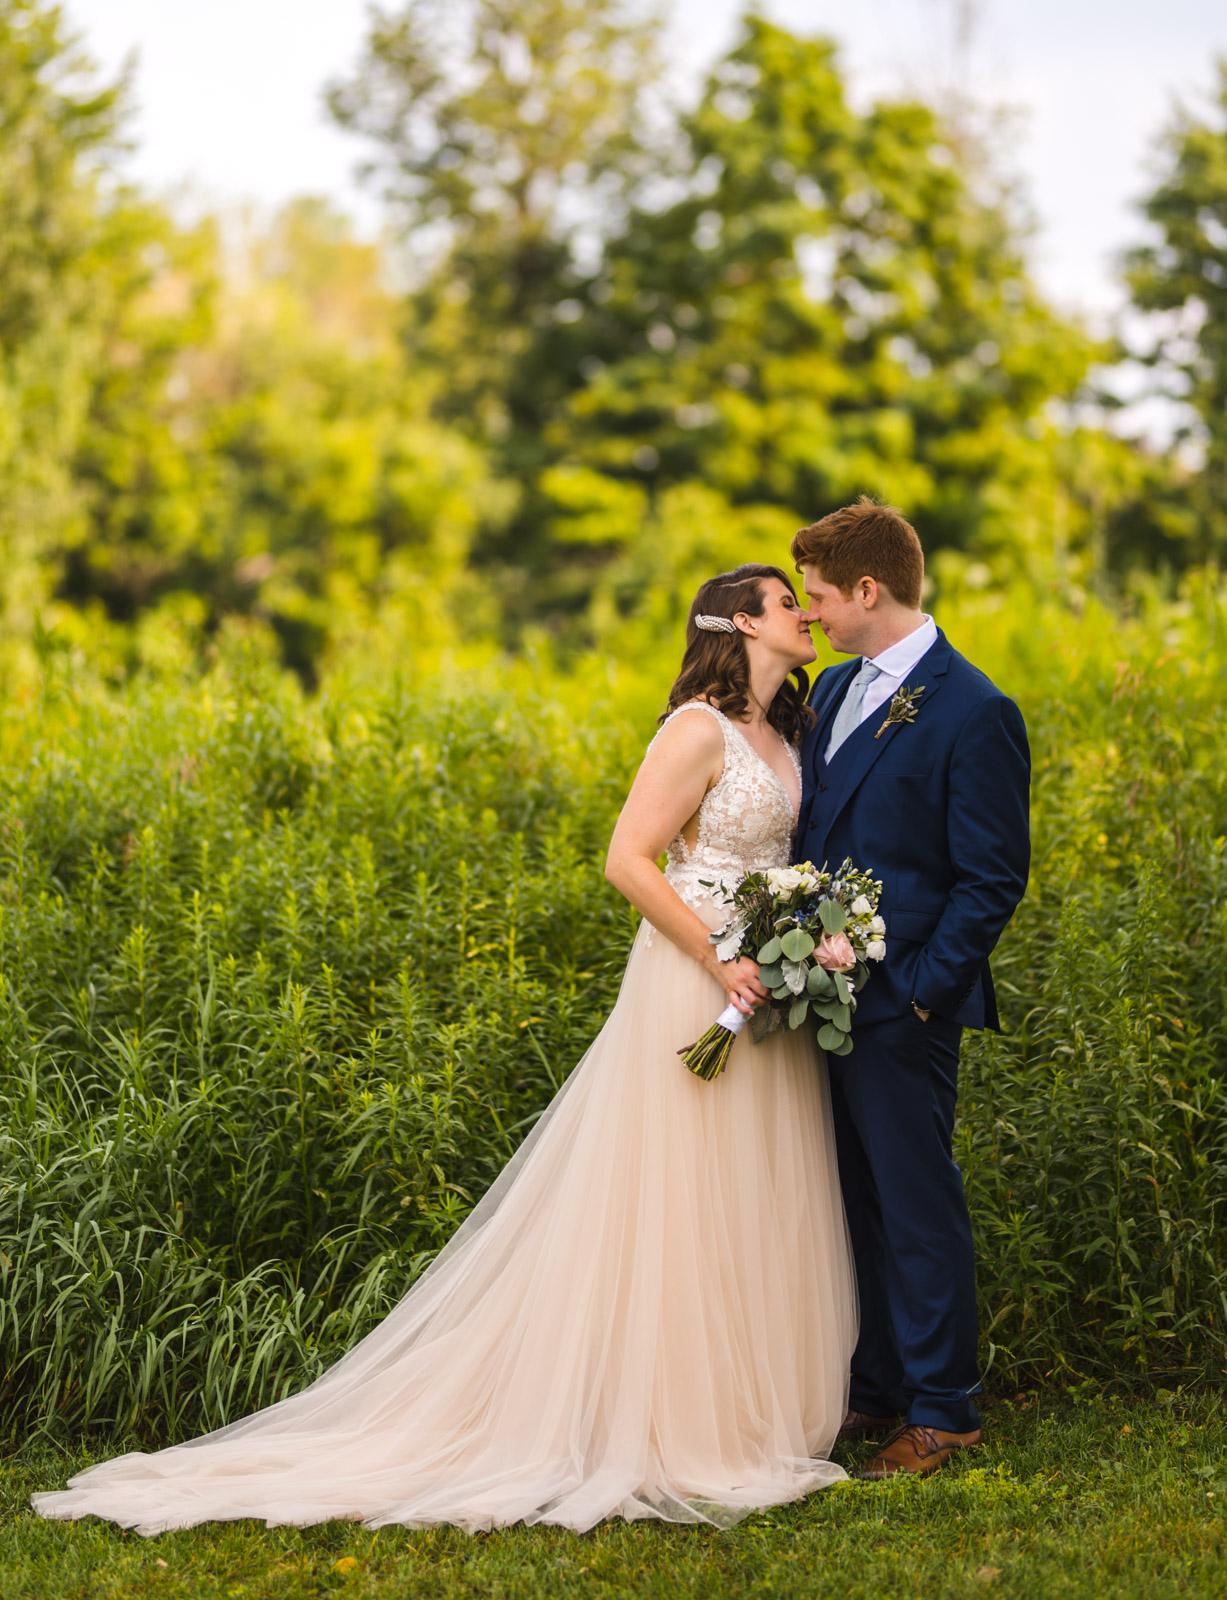 Emerson & Elicia's Golf Course Wedding Aidan & Leanne Hennebry Hamilton Wedding Videographers Photographers Niagara Hush Hush Photography & Film-45.jpg